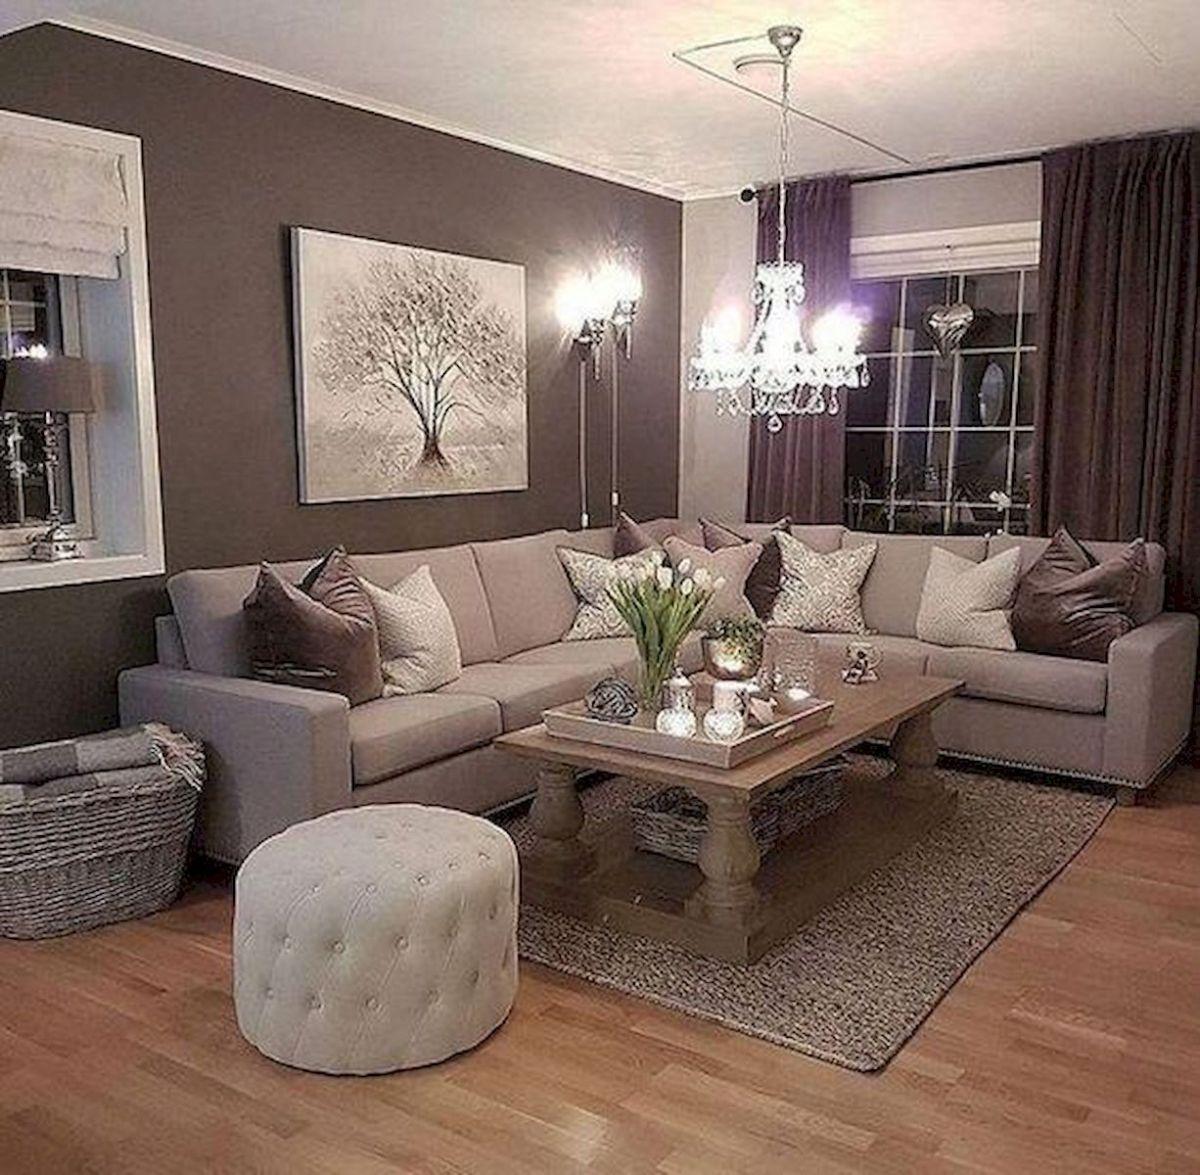 50 Gorgeous Living Room Decor and Design Ideas (35)